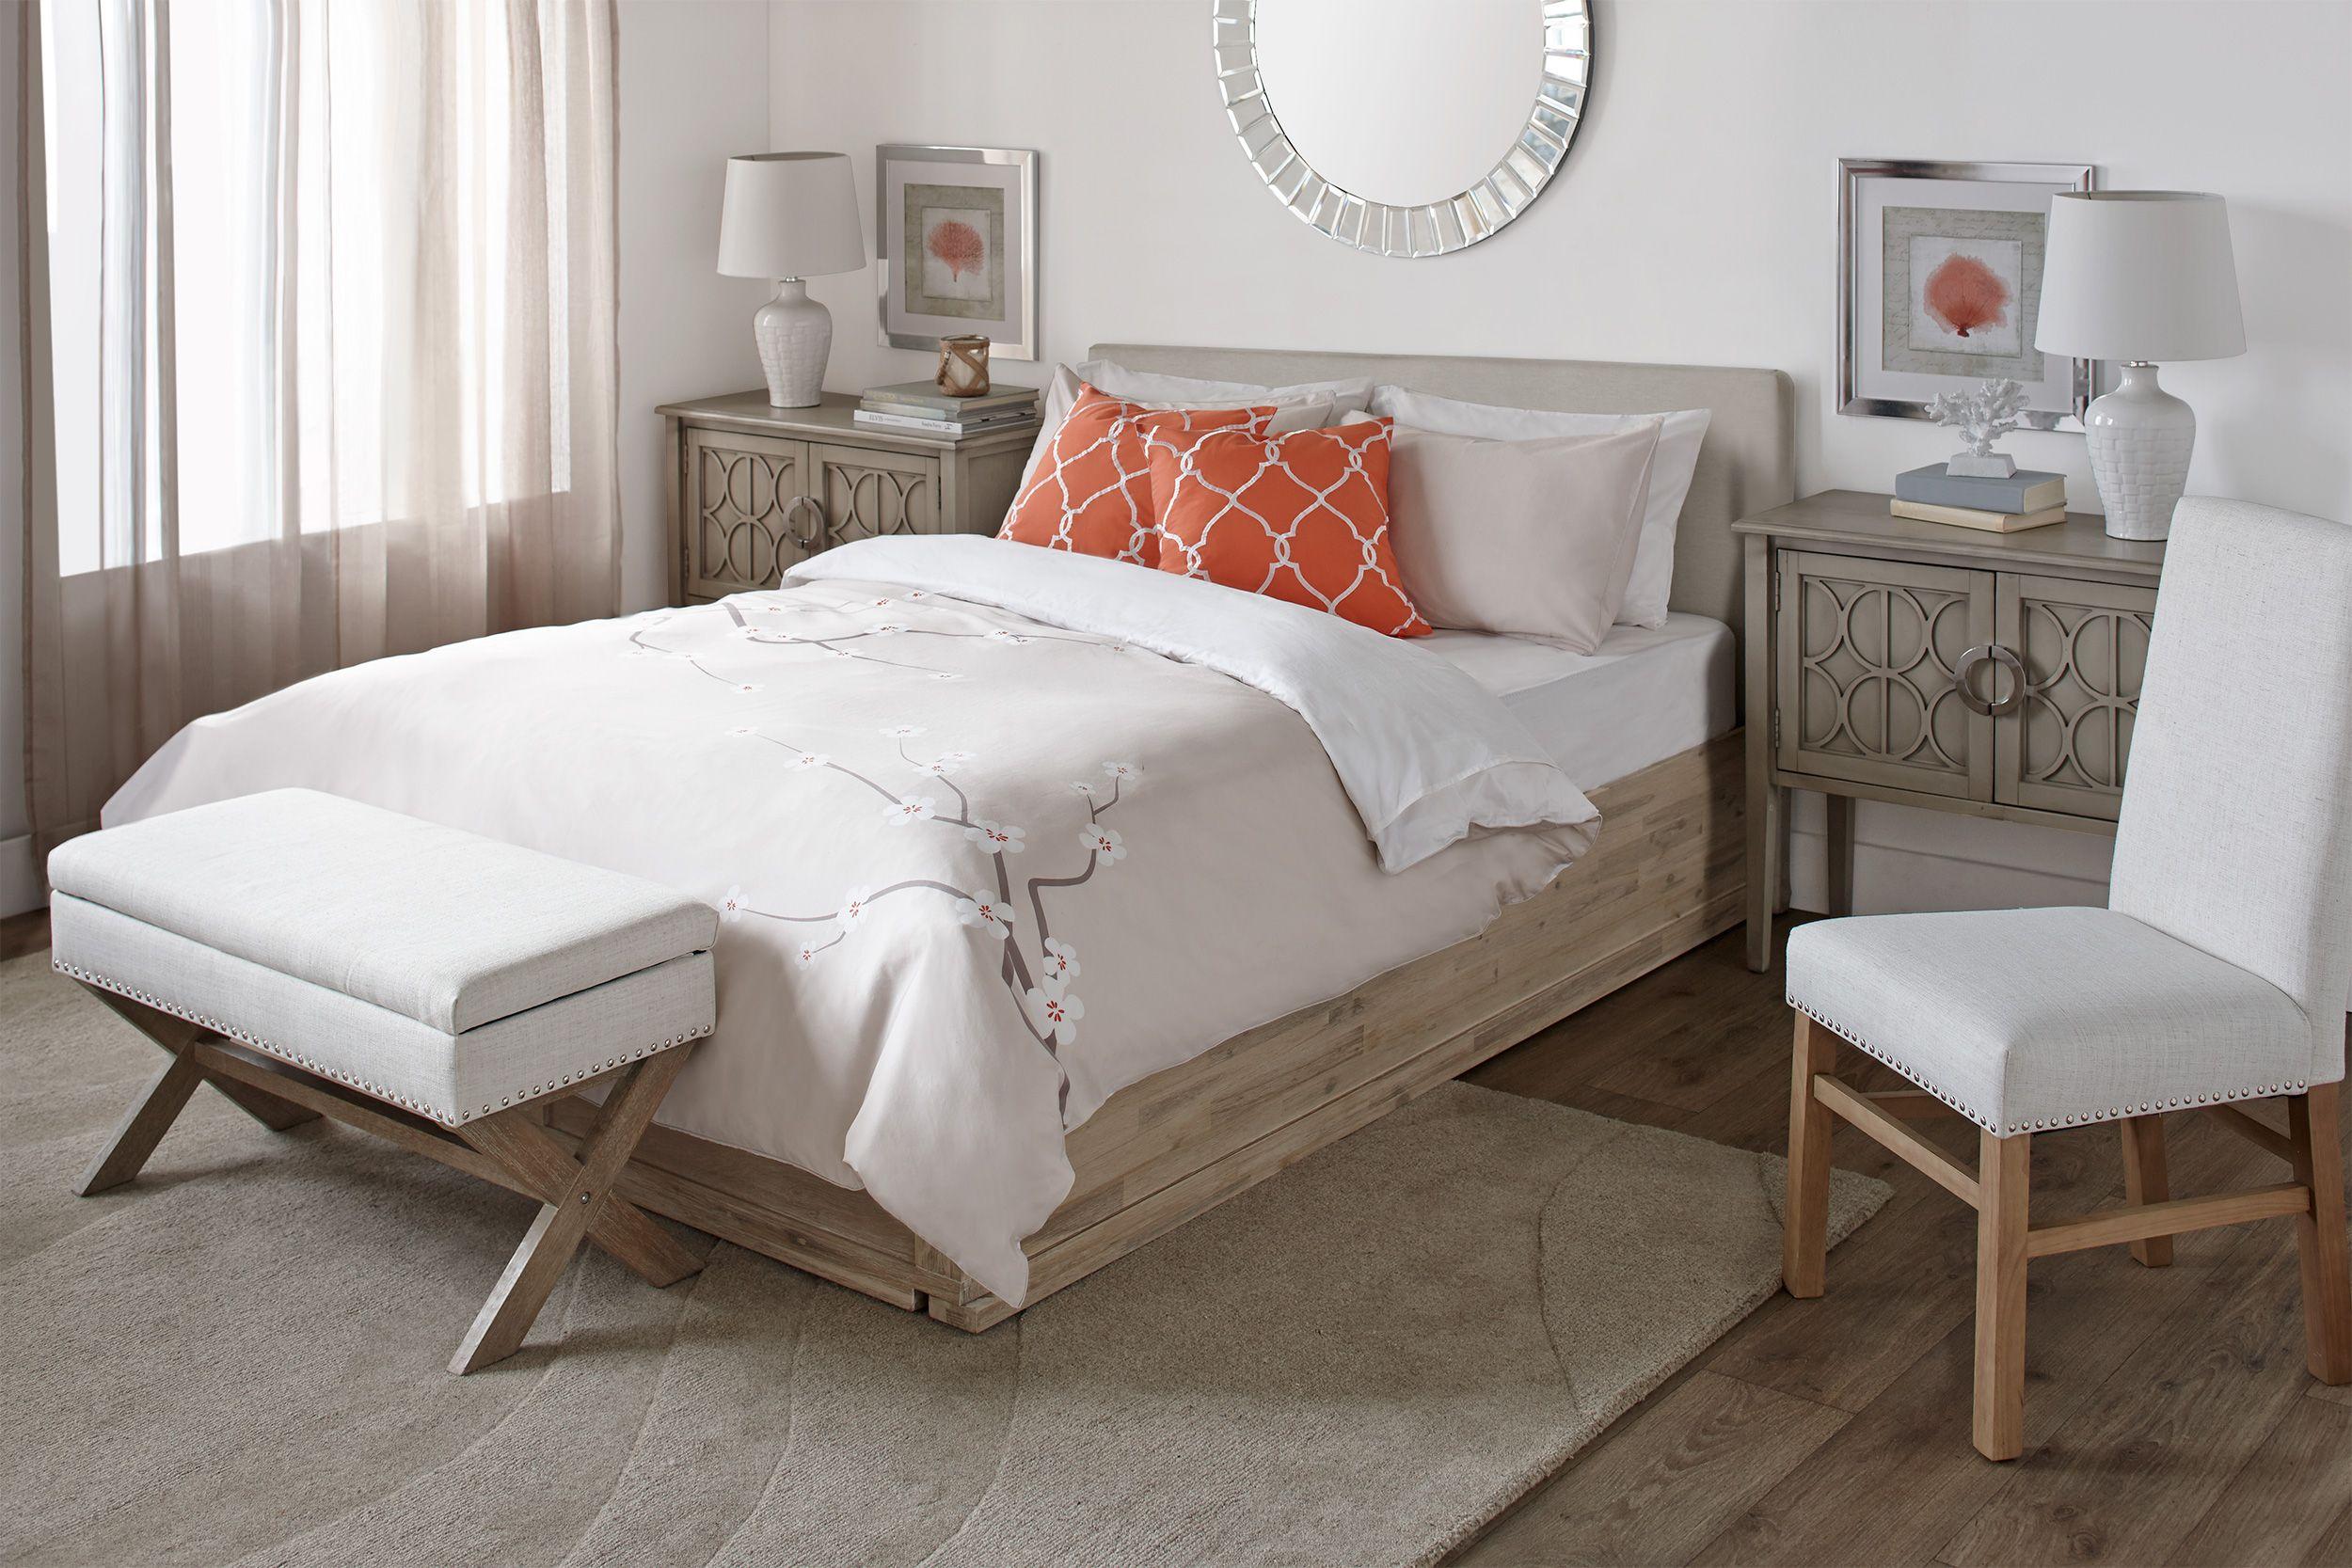 Moika Bedroom Decor Comforter sets, Bouclair home